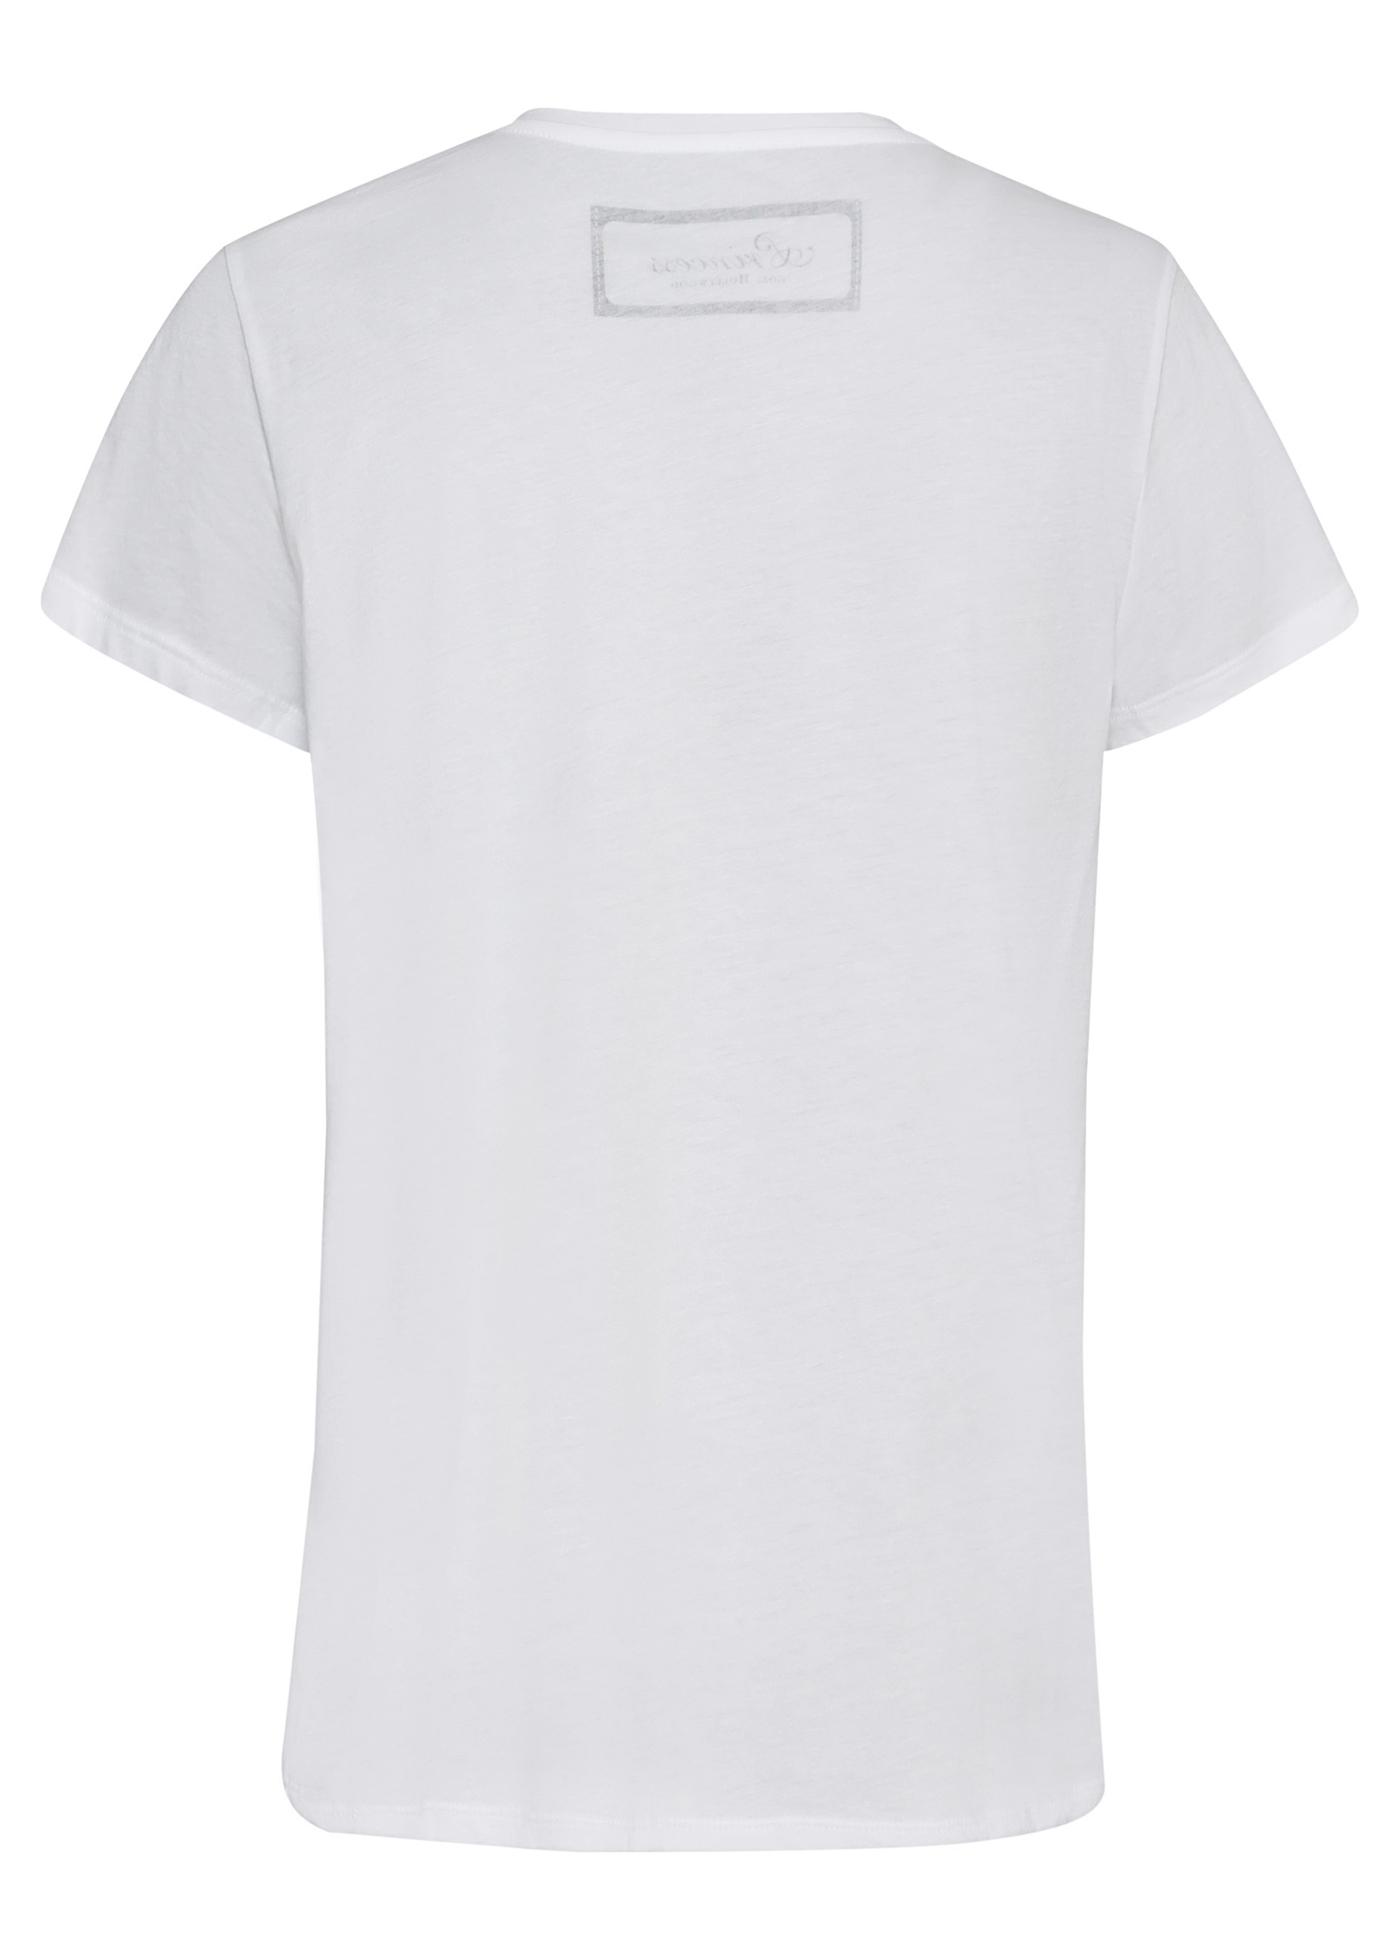 T-Shirt glitter circle tee image number 1